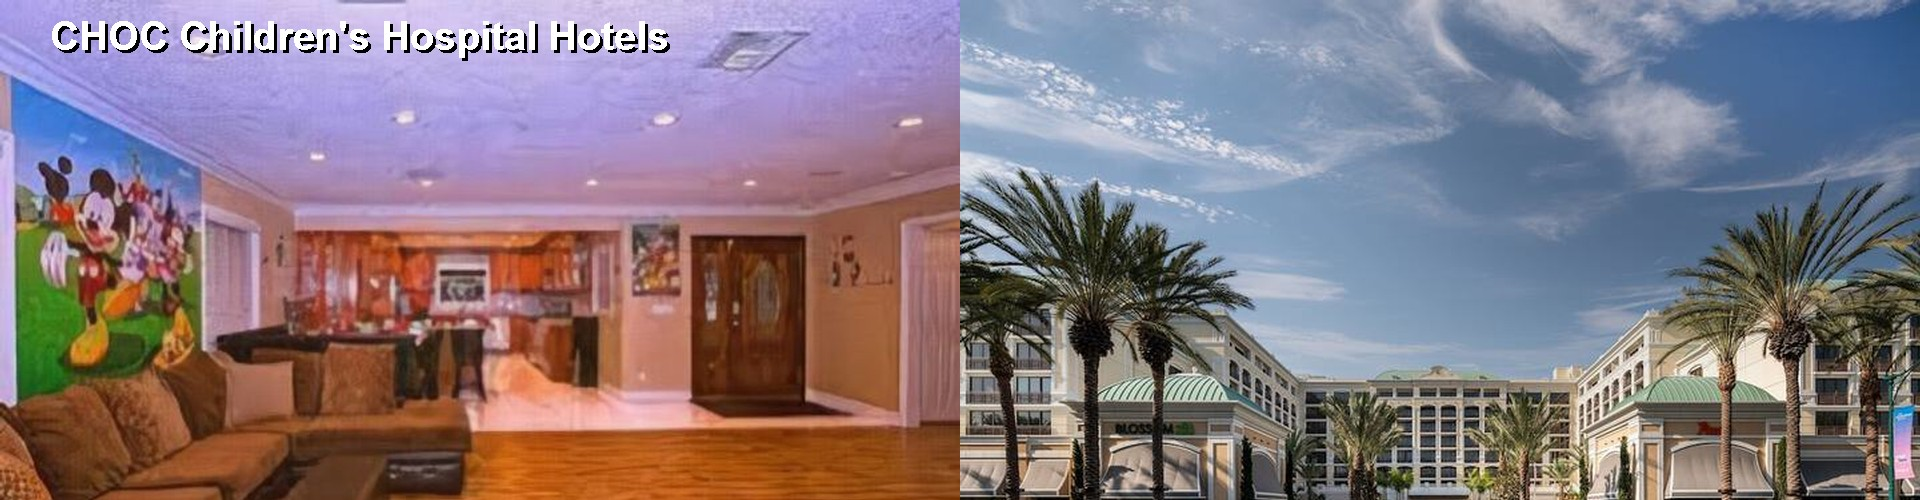 58 Hotels Near Choc Children S Hospital In Orange Ca